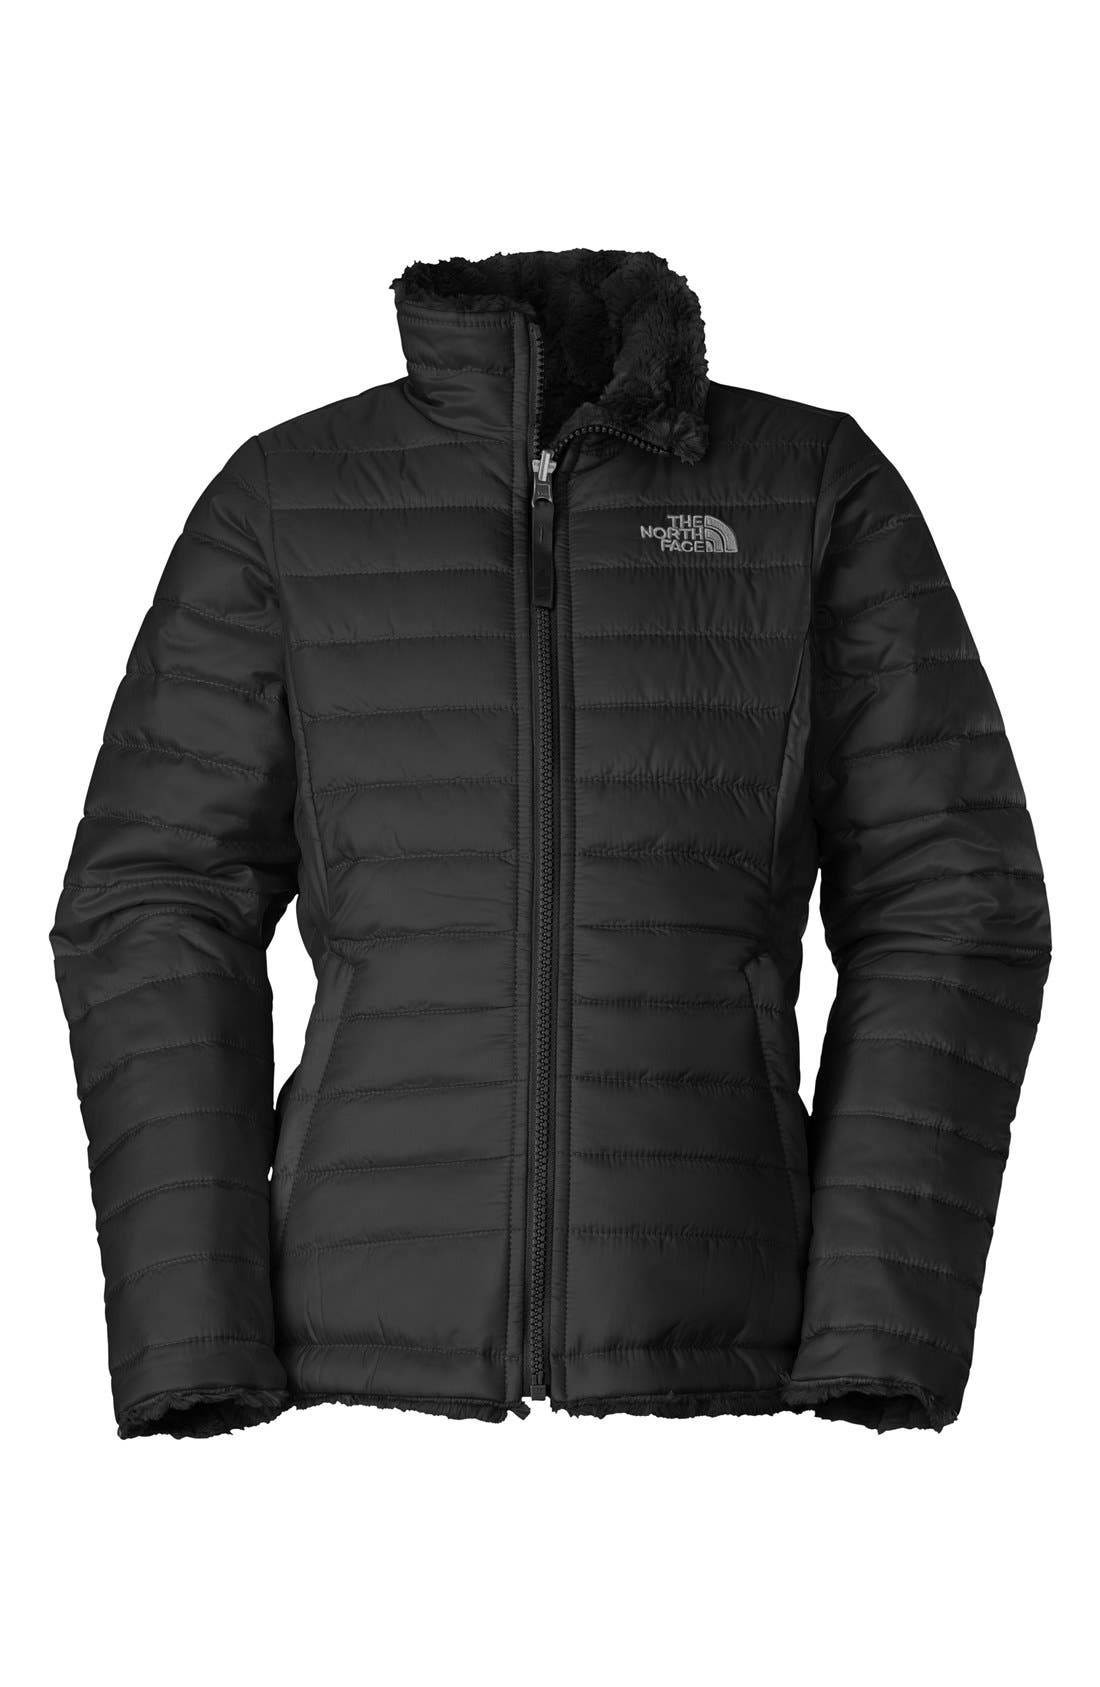 girls black coats jackets outerwear rain fleece hood nordstrom rh shop nordstrom com